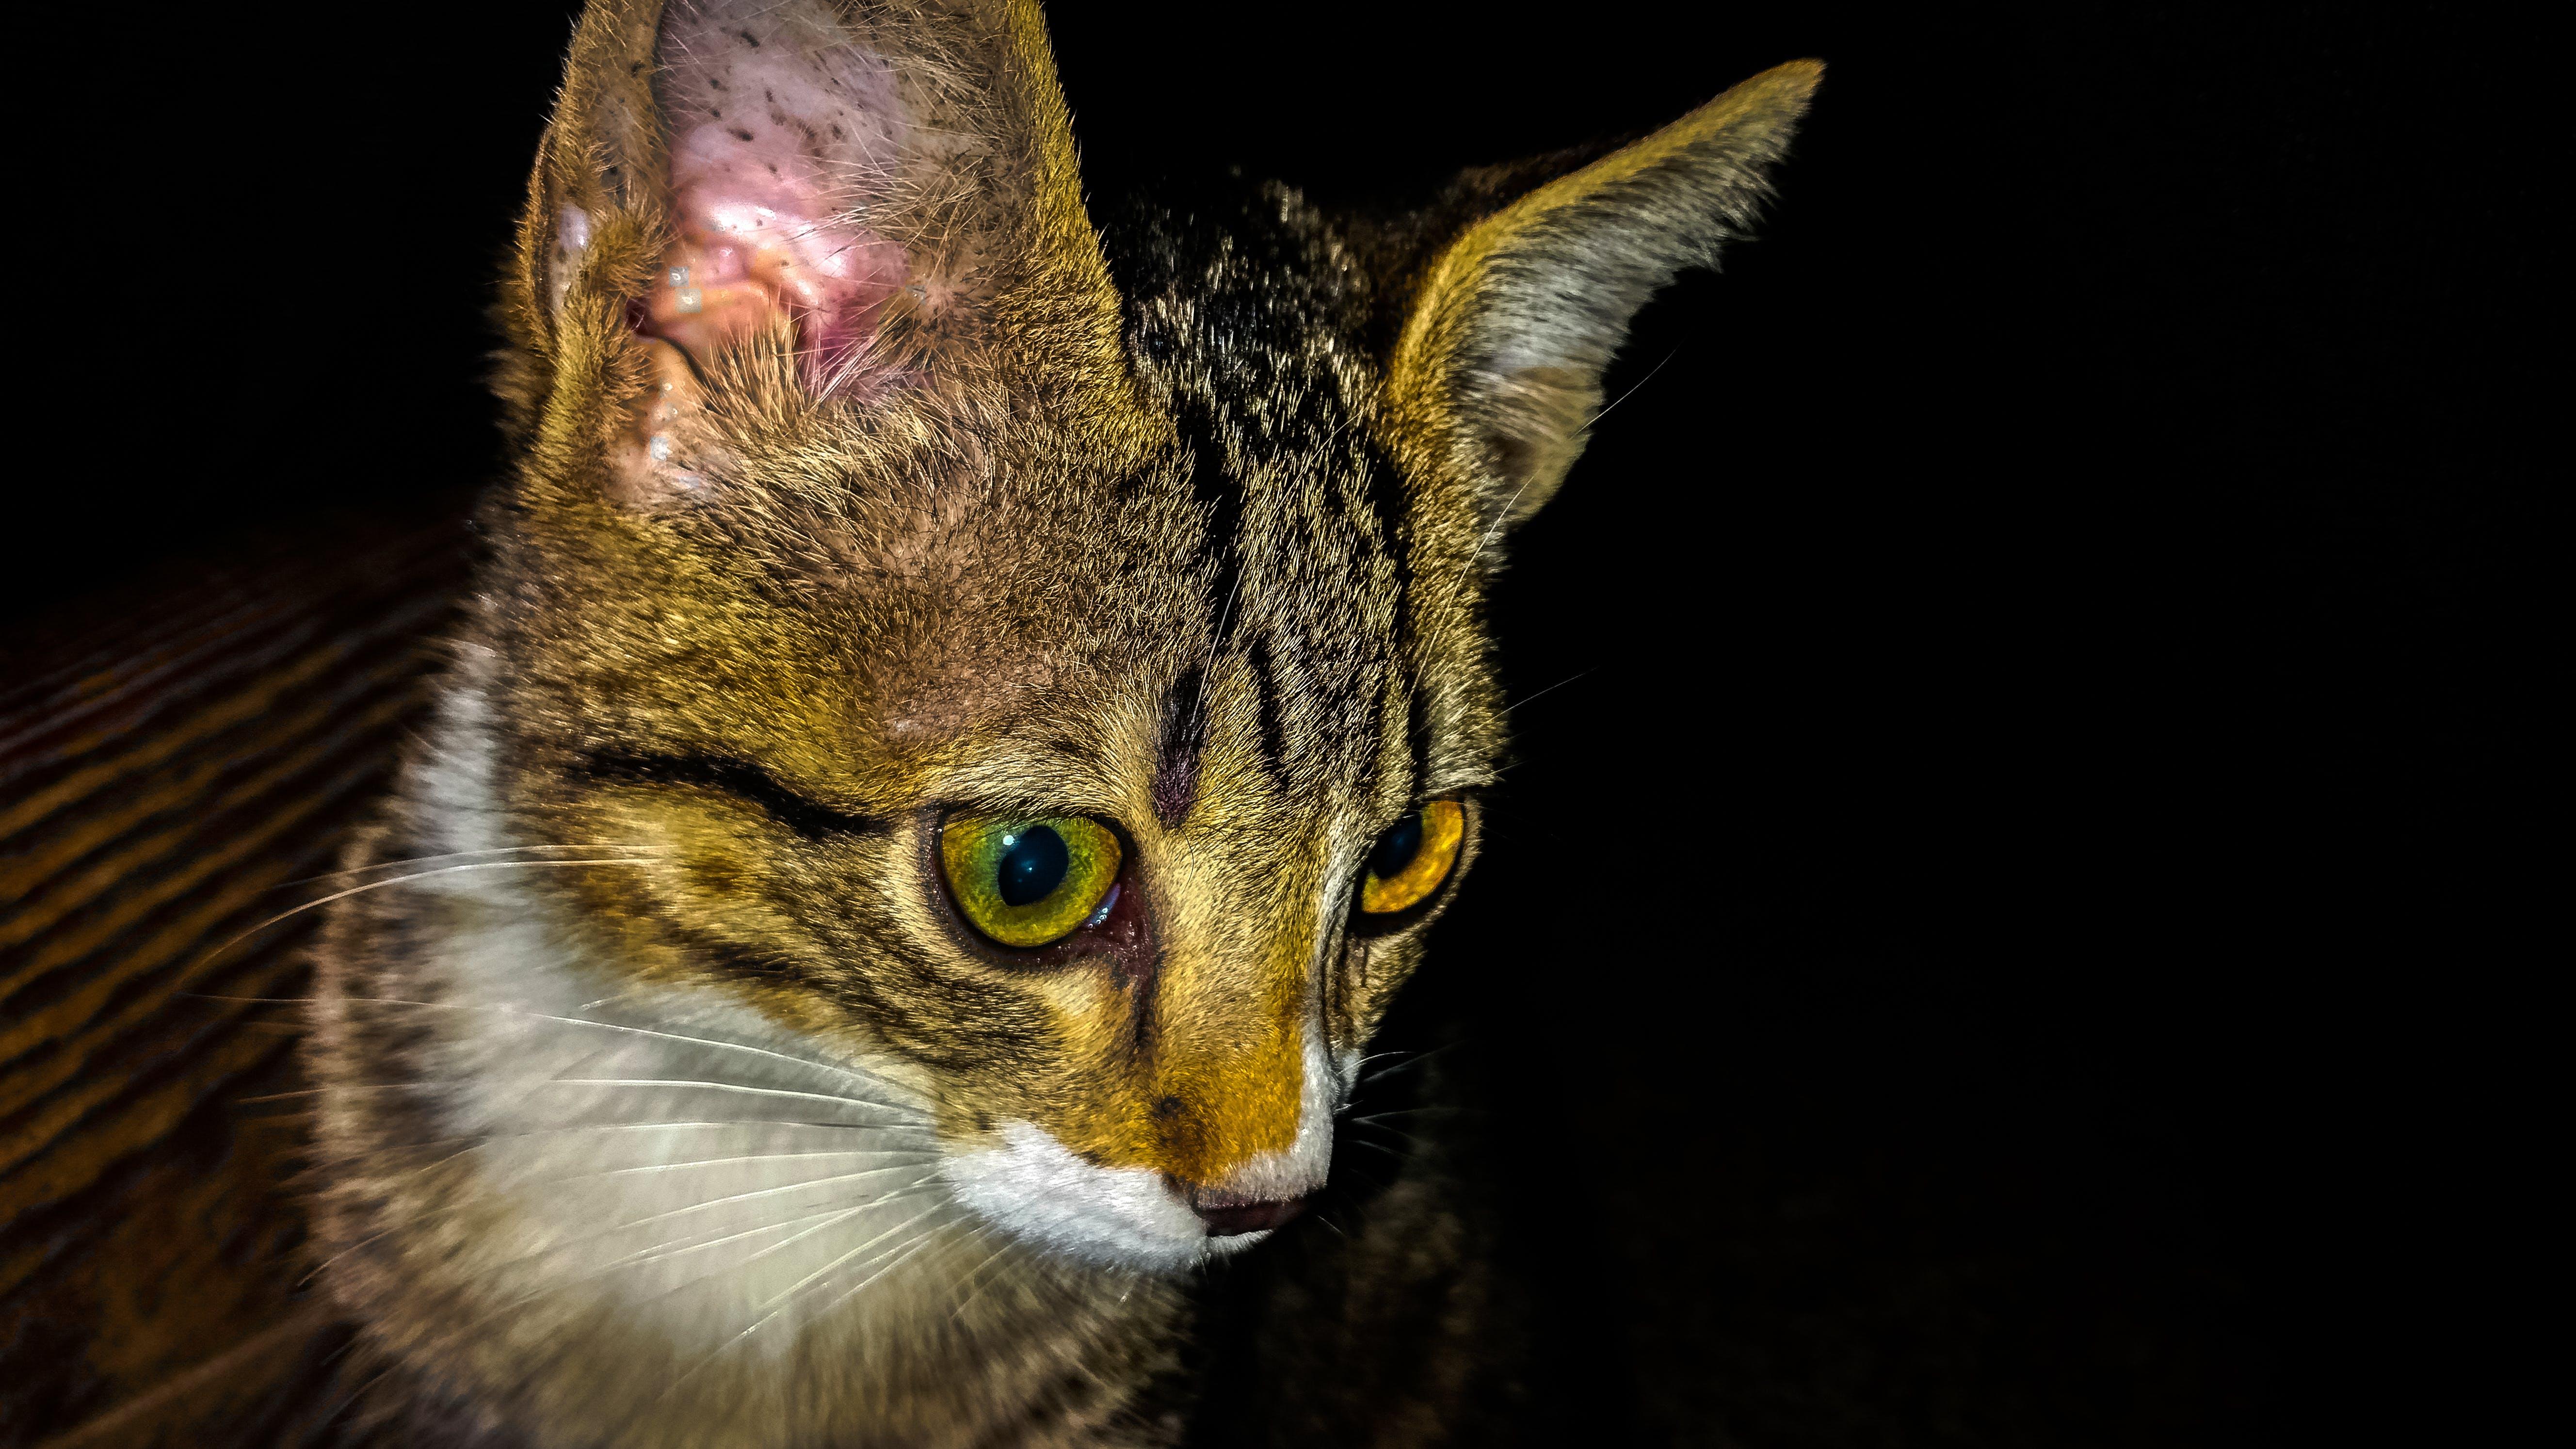 Free stock photo of cat, cat face